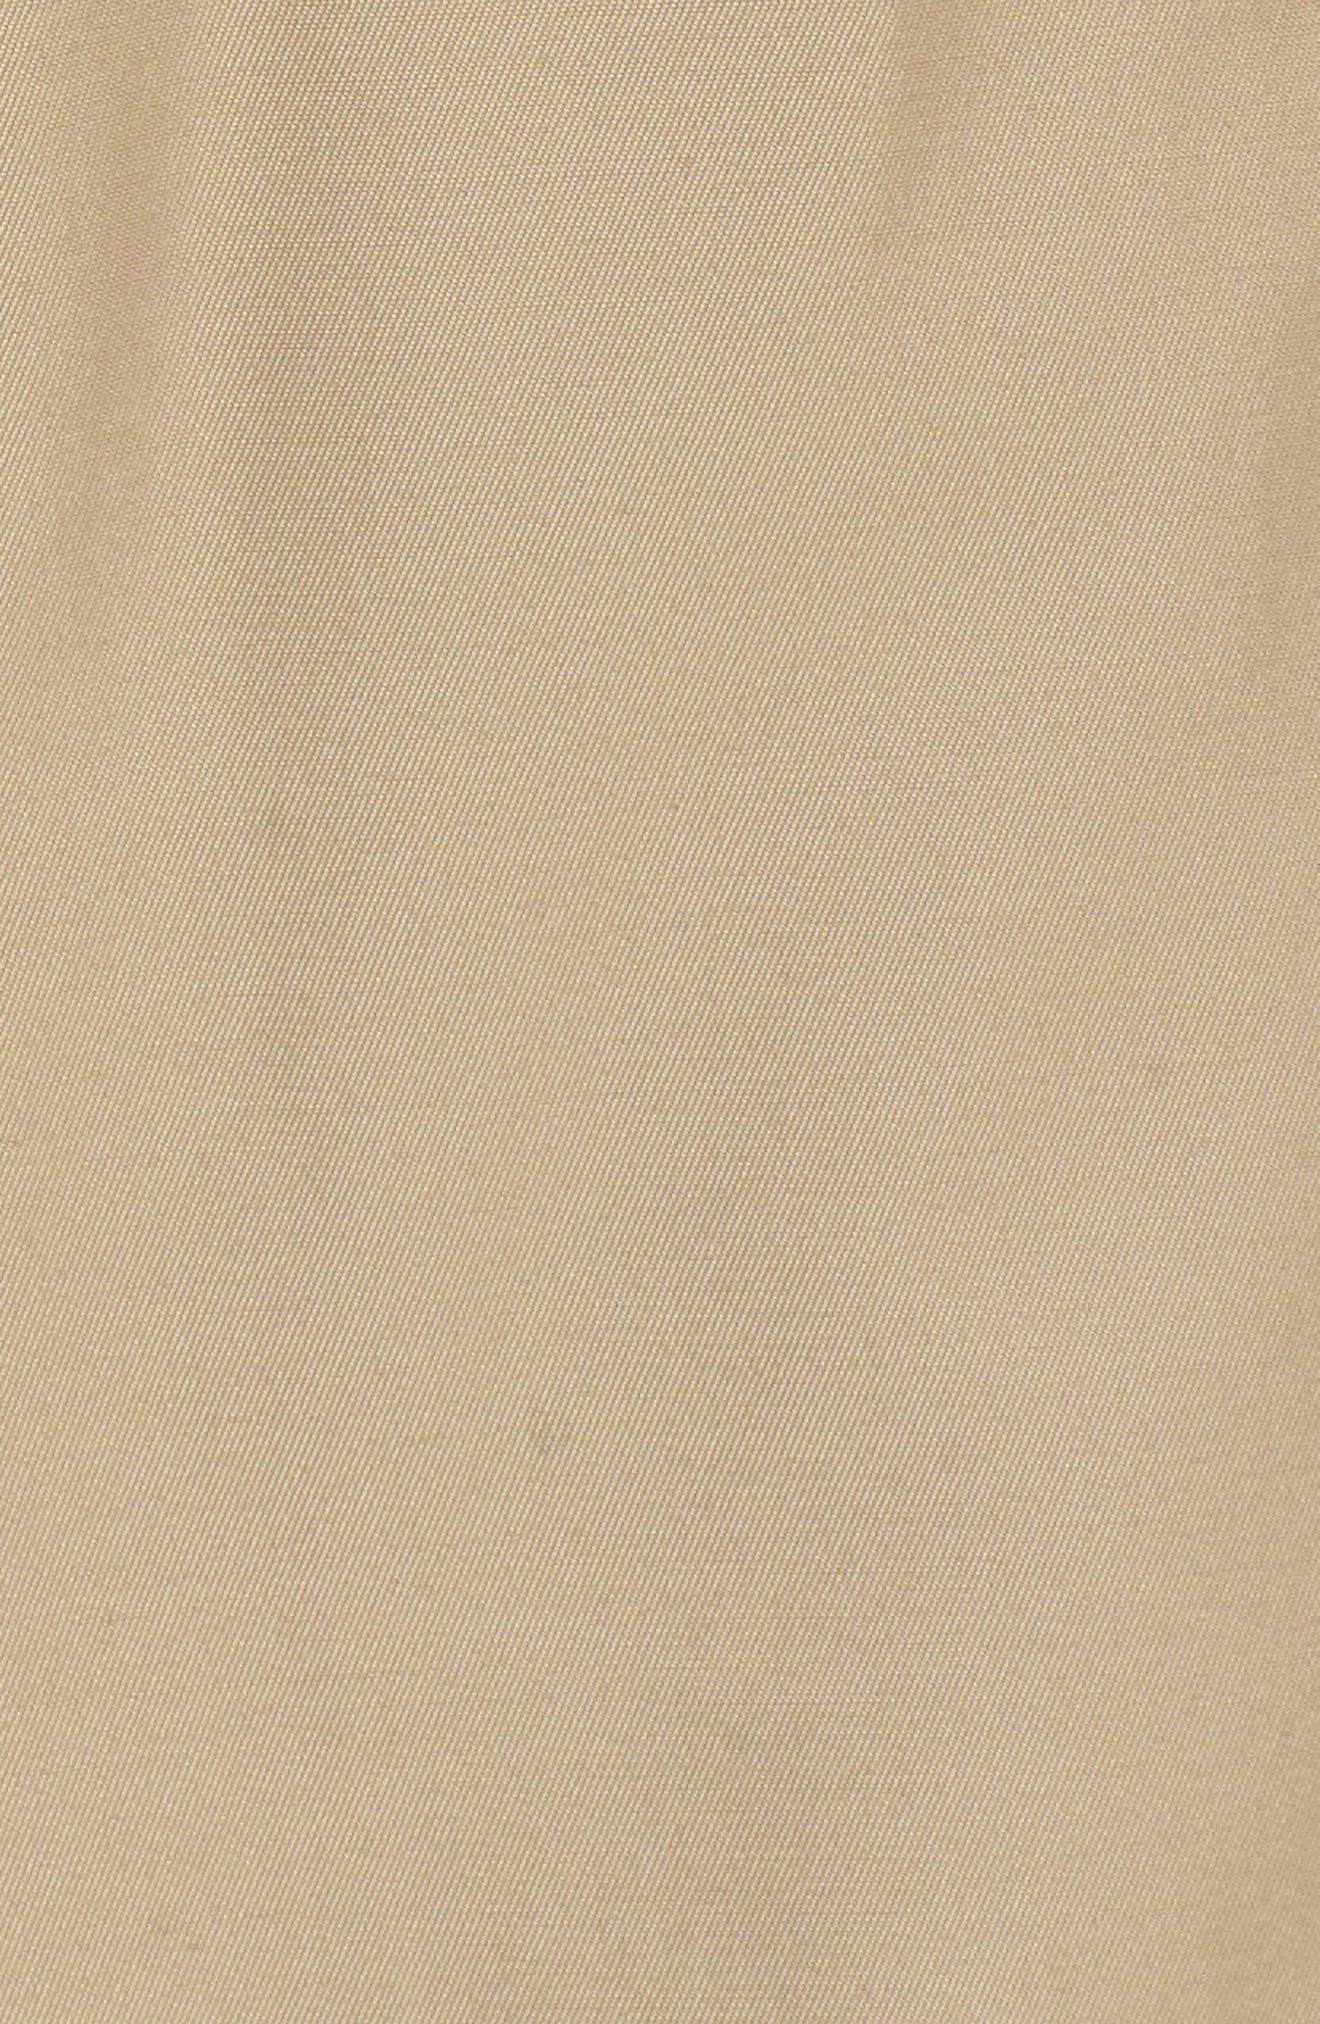 Long Trench Coat,                             Alternate thumbnail 12, color,